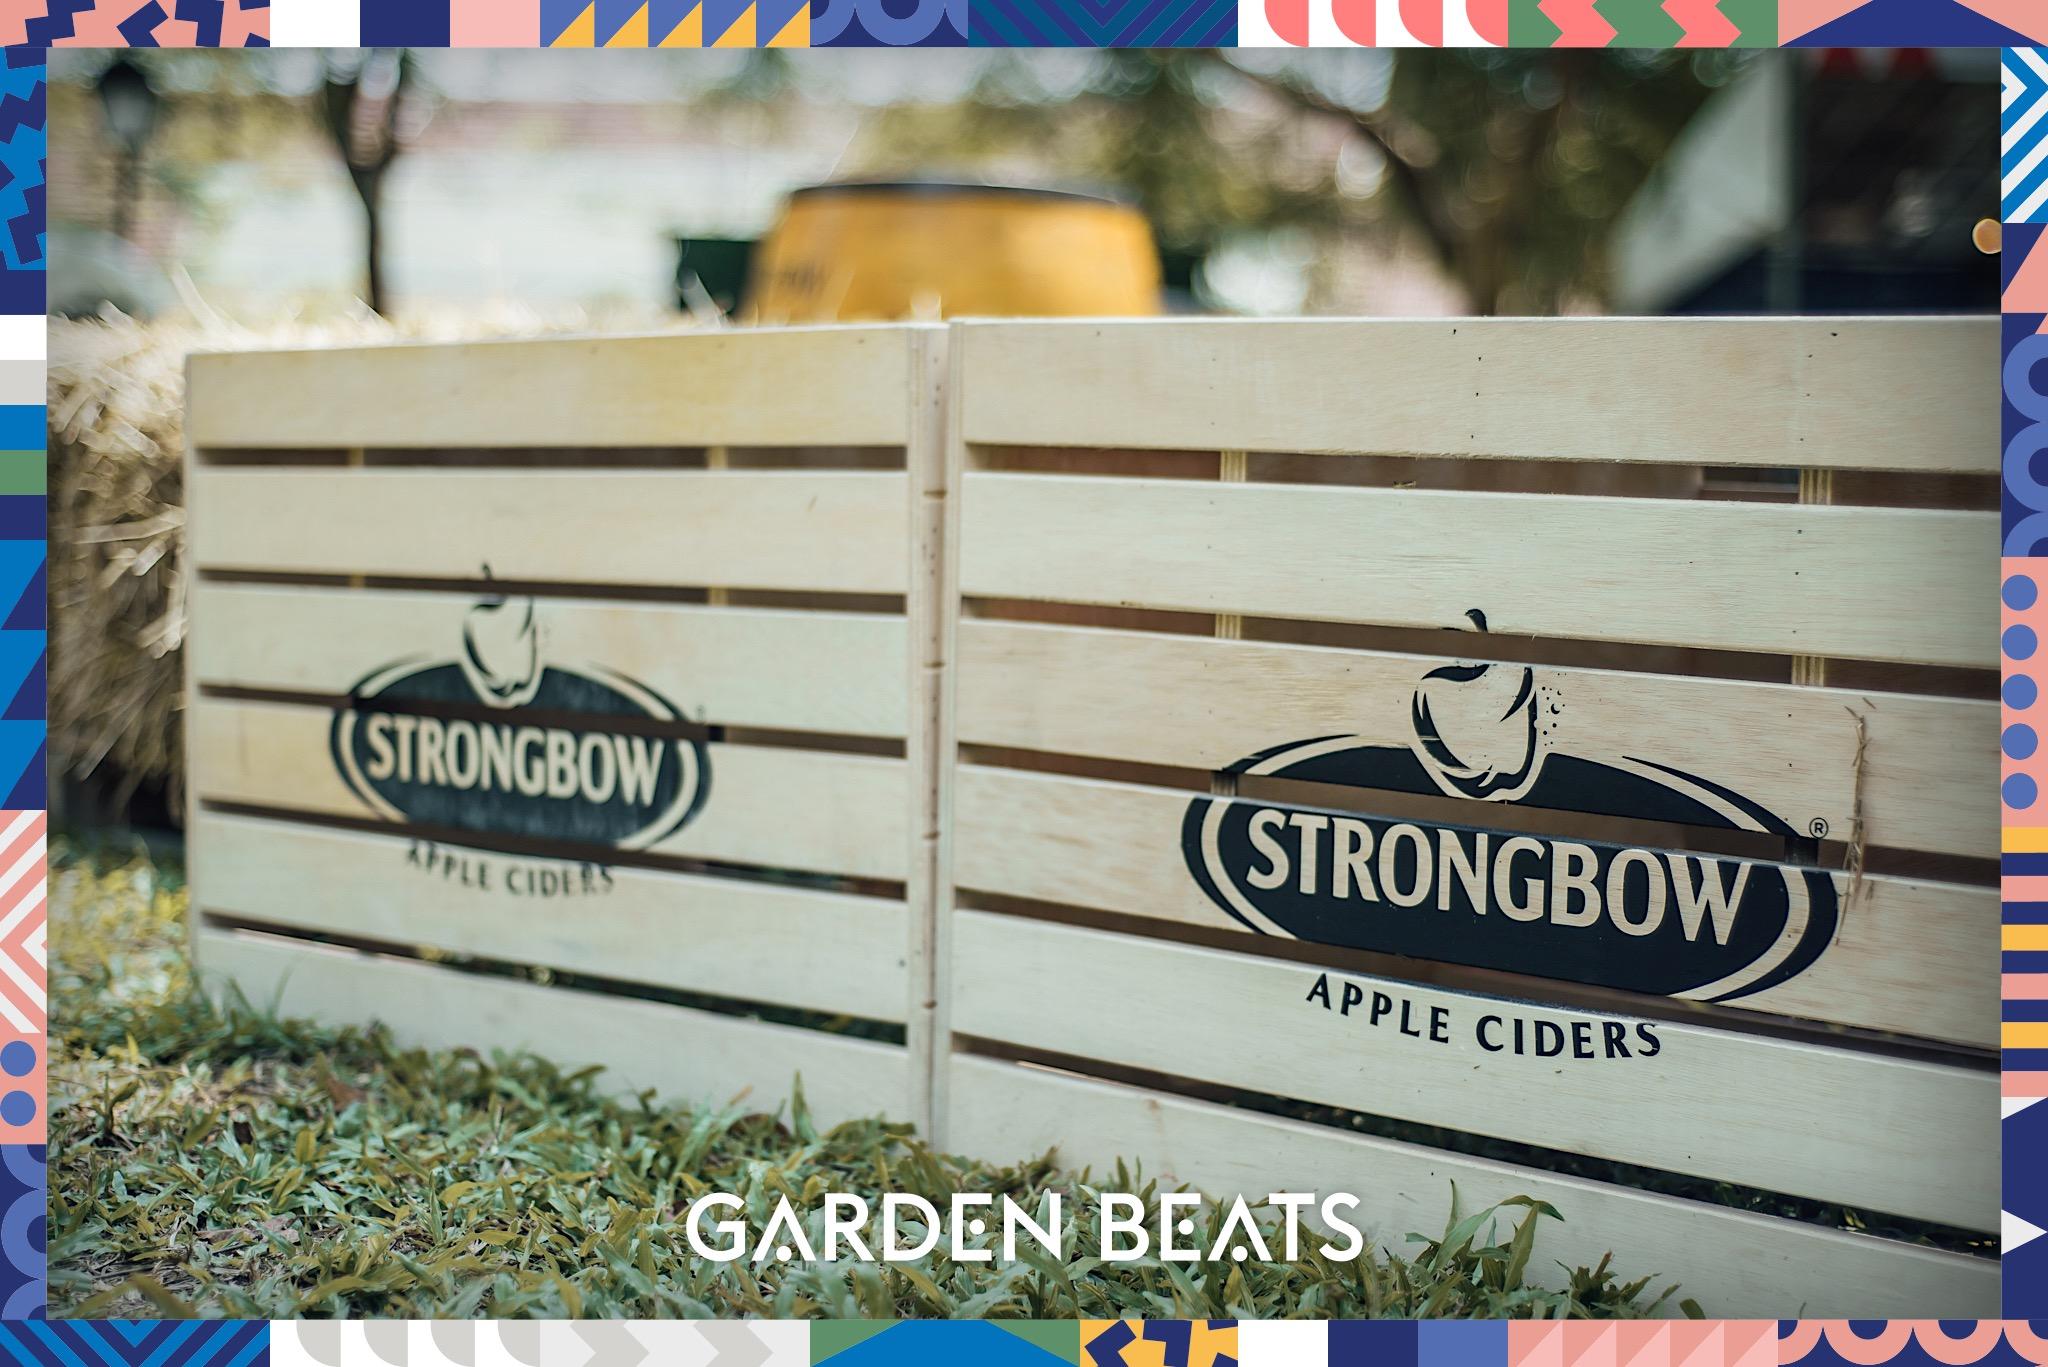 18032017_GardenBeats_Colossal002_WatermarkedGB.jpg